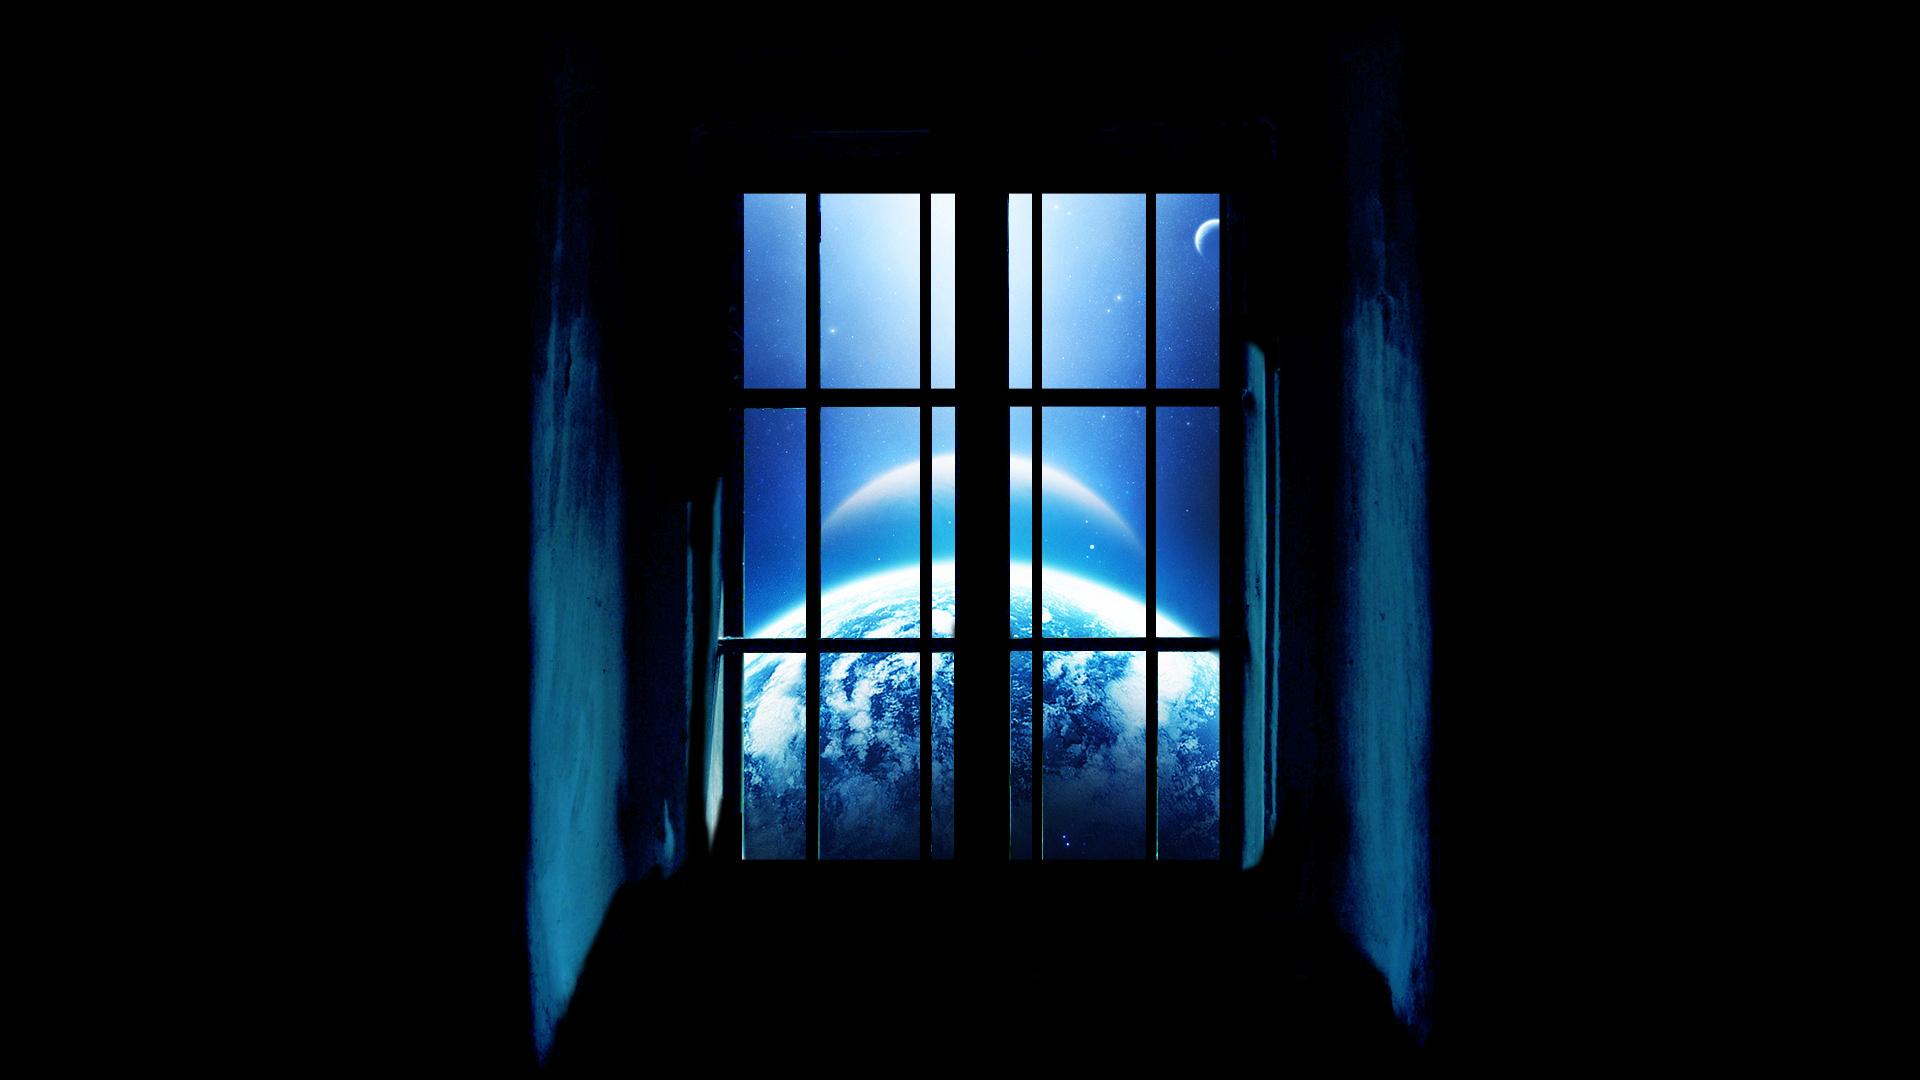 Windows Background wallpaper   667206 1920x1080